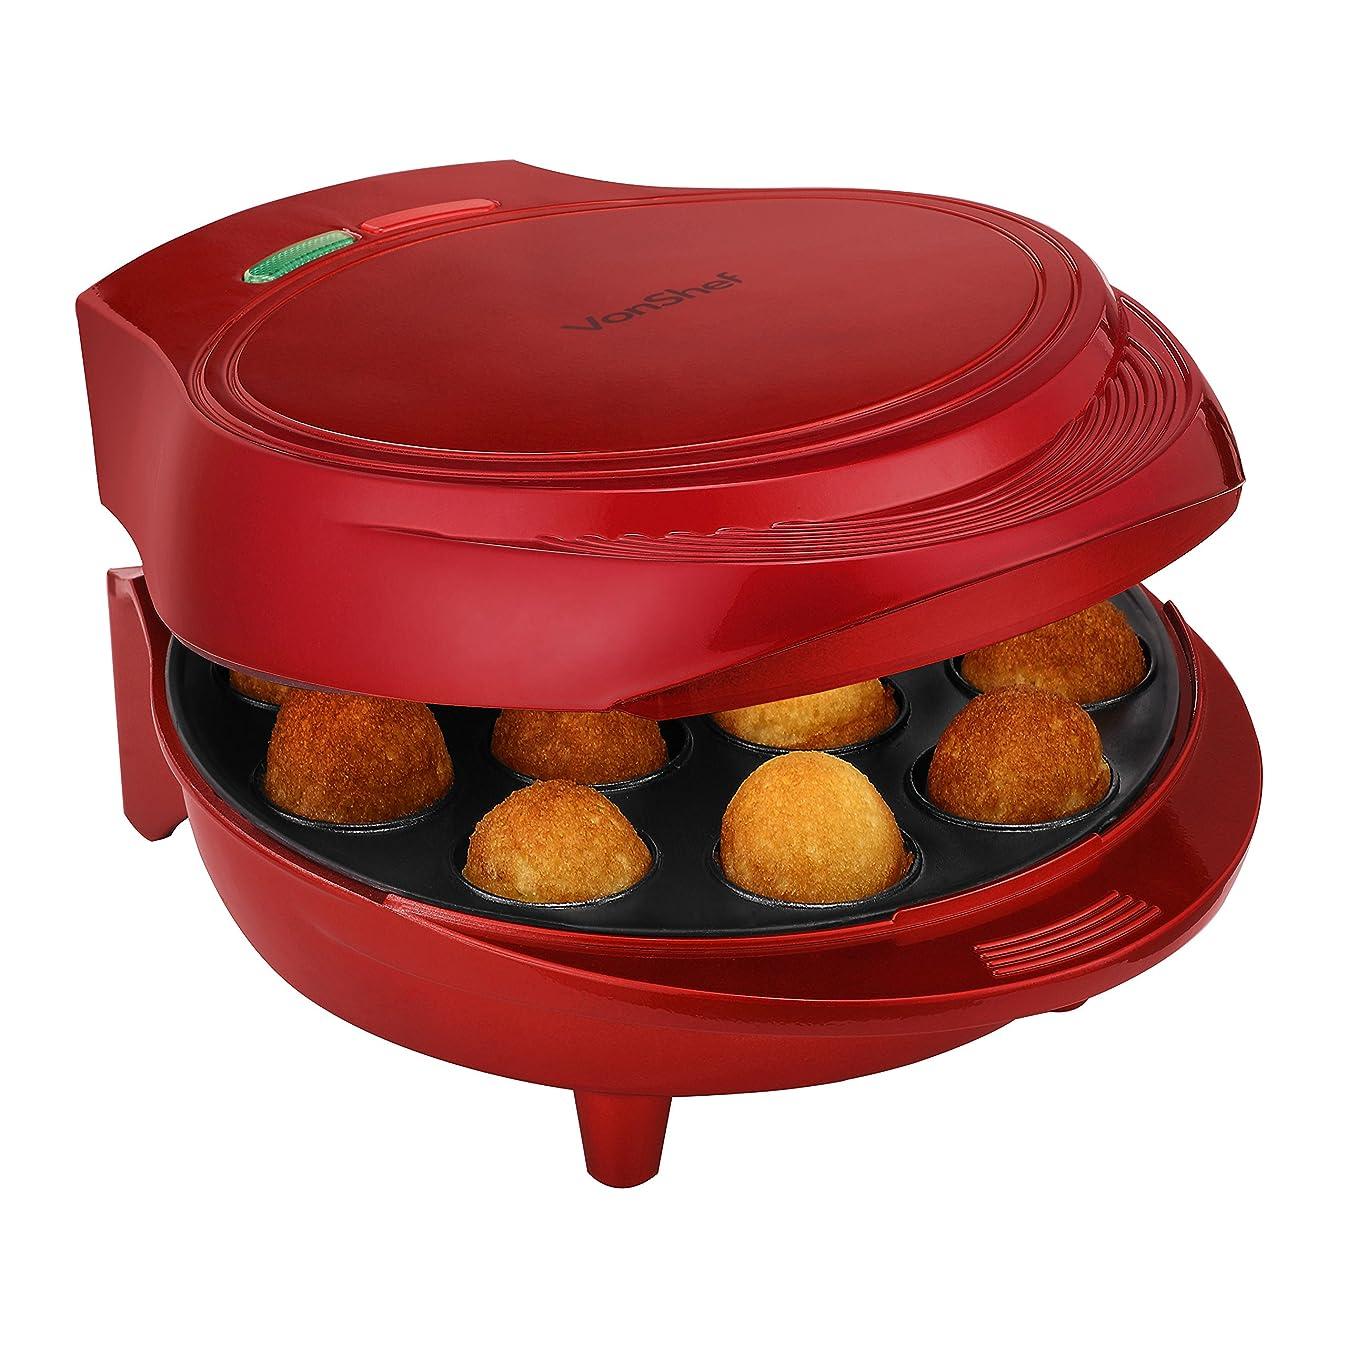 VonShef 12 Cake Pop Maker Machine Set Includes Sticks & Stand - Red